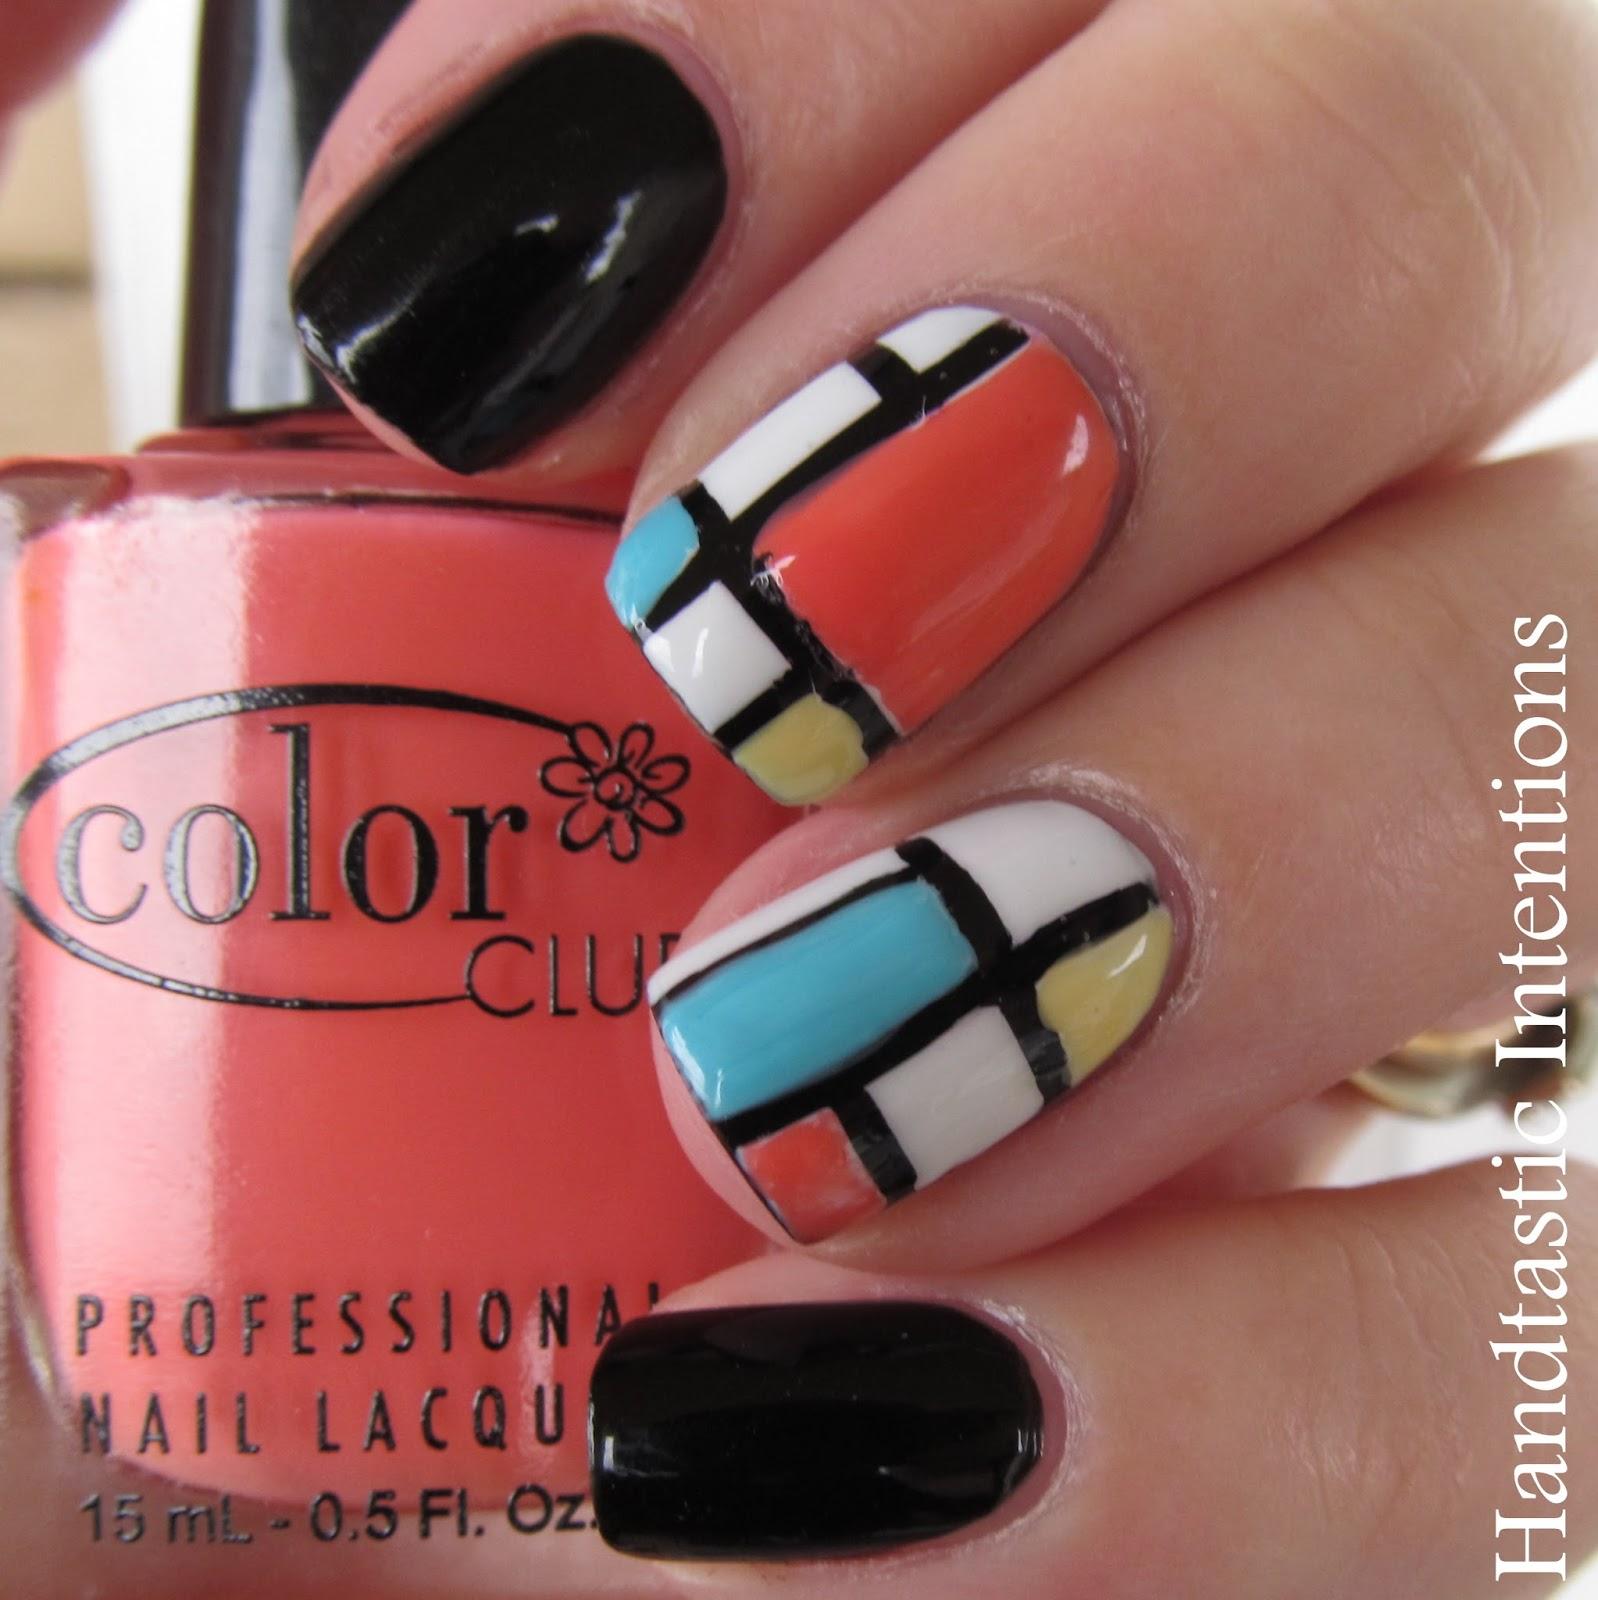 Handtastic Intentions: Nail Art: Mondrian Inspired